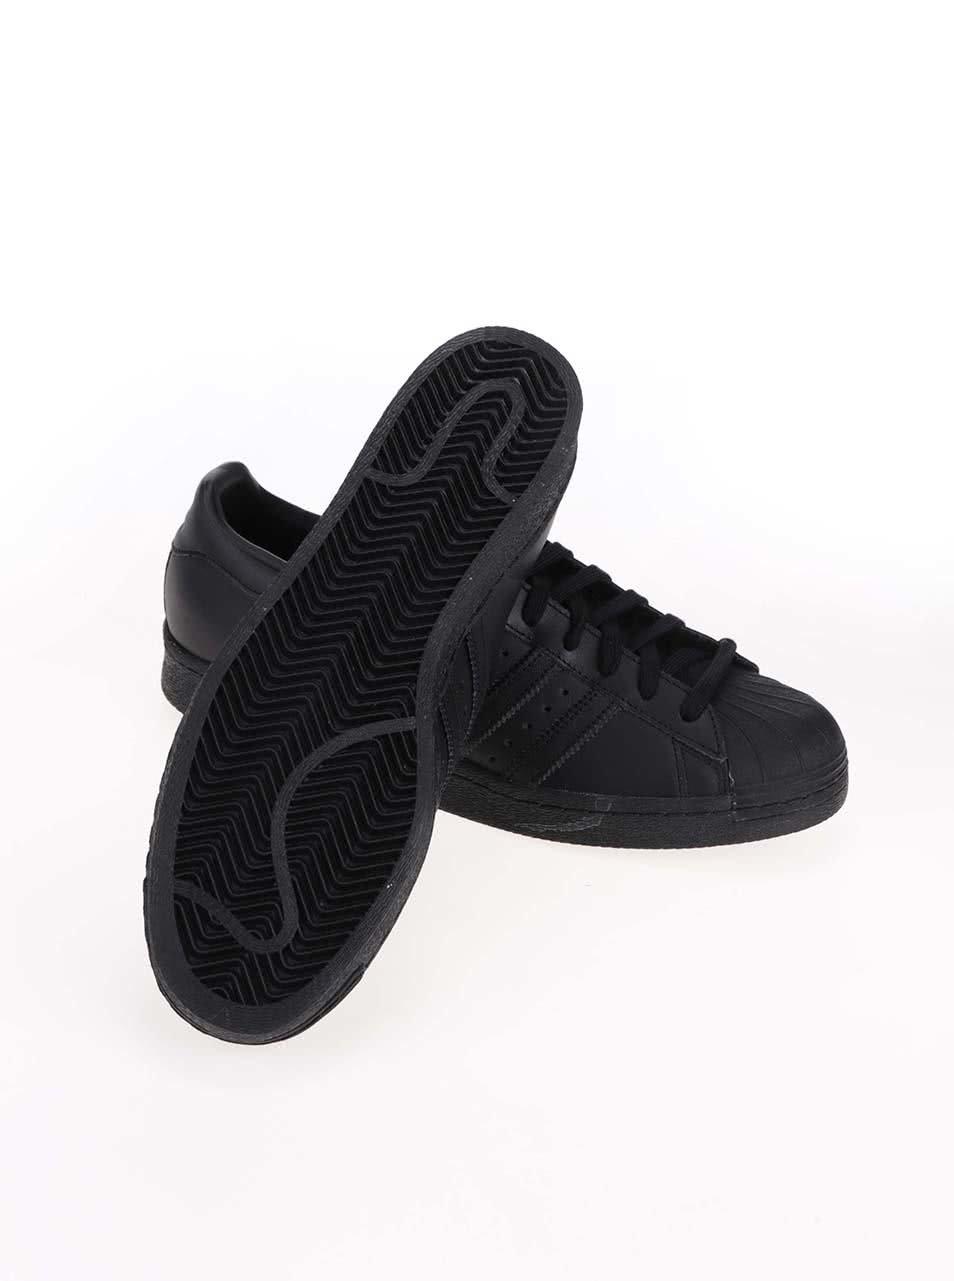 Černé pánské kožené tenisky adidas Originals Superstar  80s ... 3bb77f2934